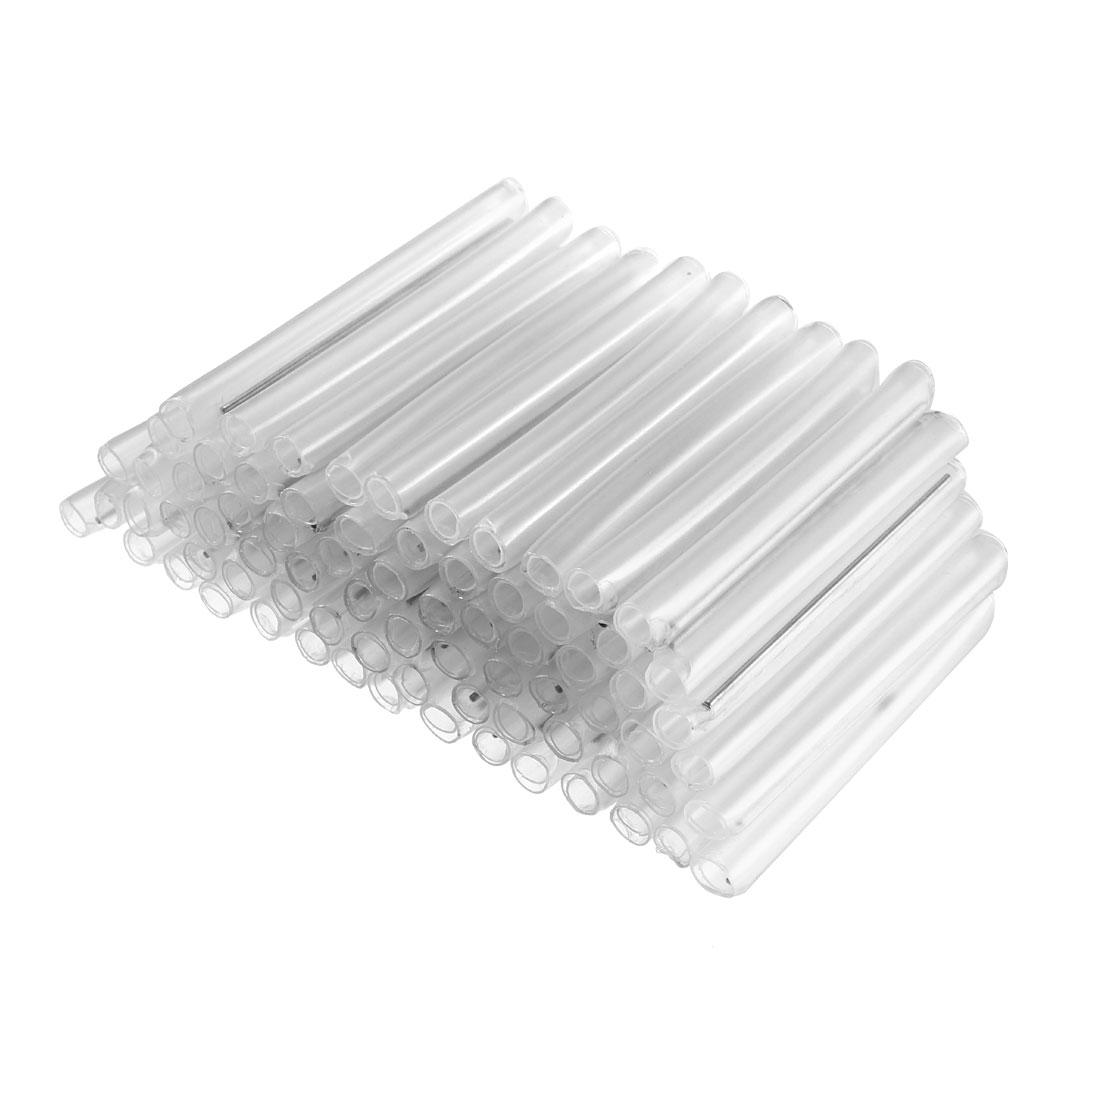 58mm 5.6mmOD Fiber Optic Splice Tube Protector, Heat Shrinkable Tubing 300pcs